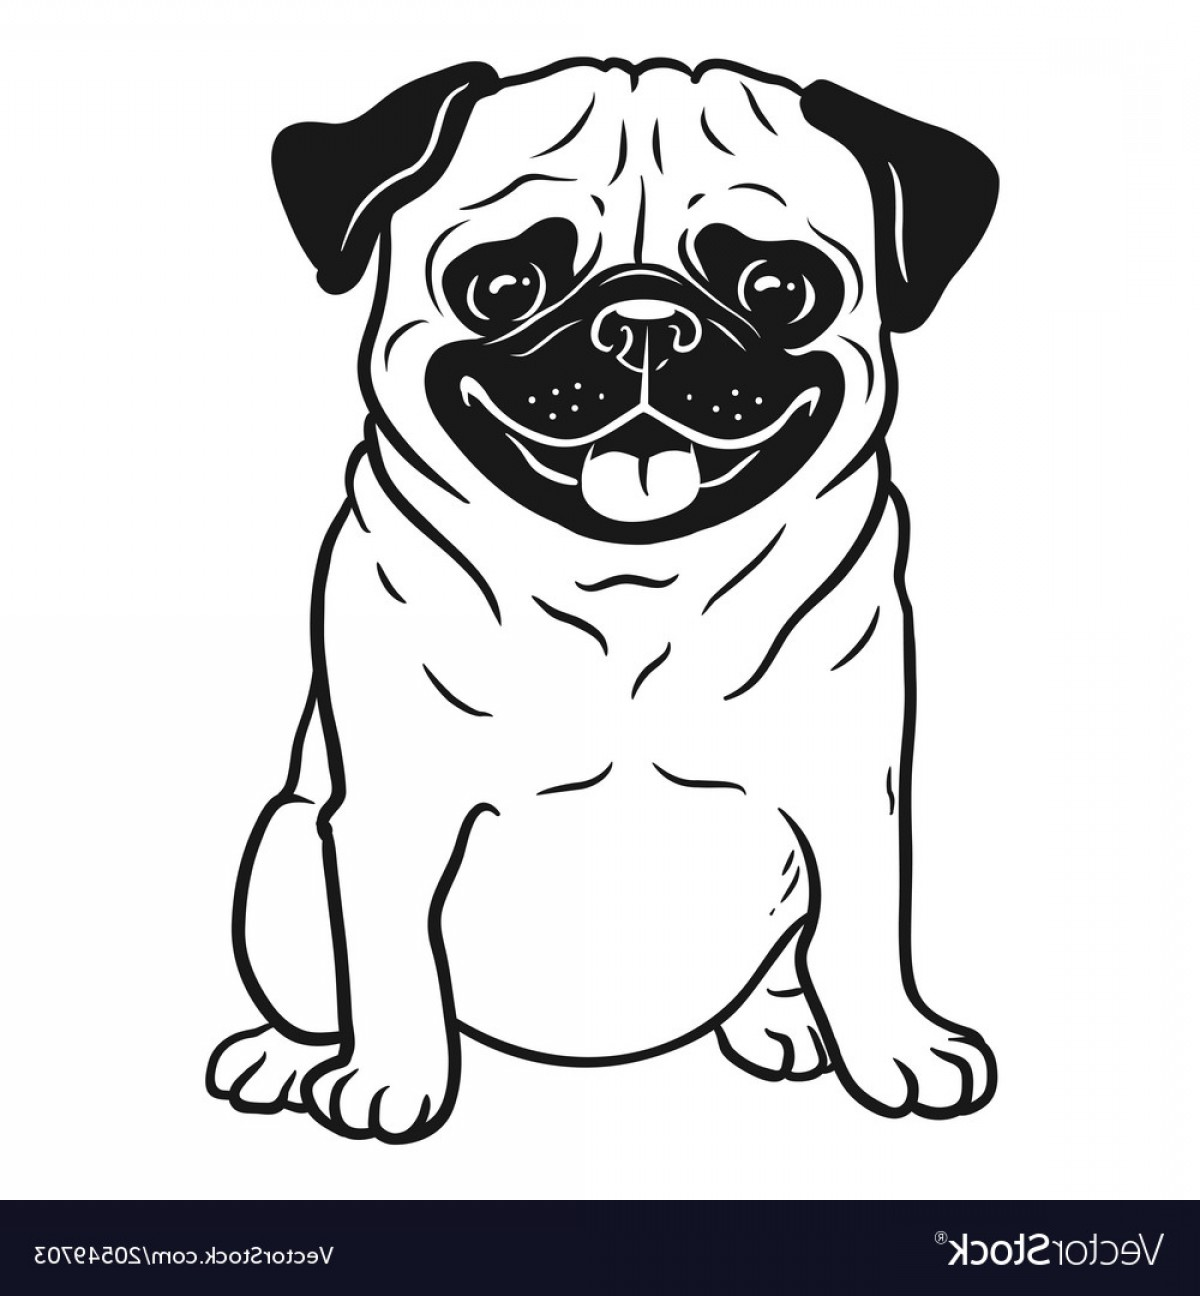 Pug Dog Black And White Hand Drawn Cartoon Vector.